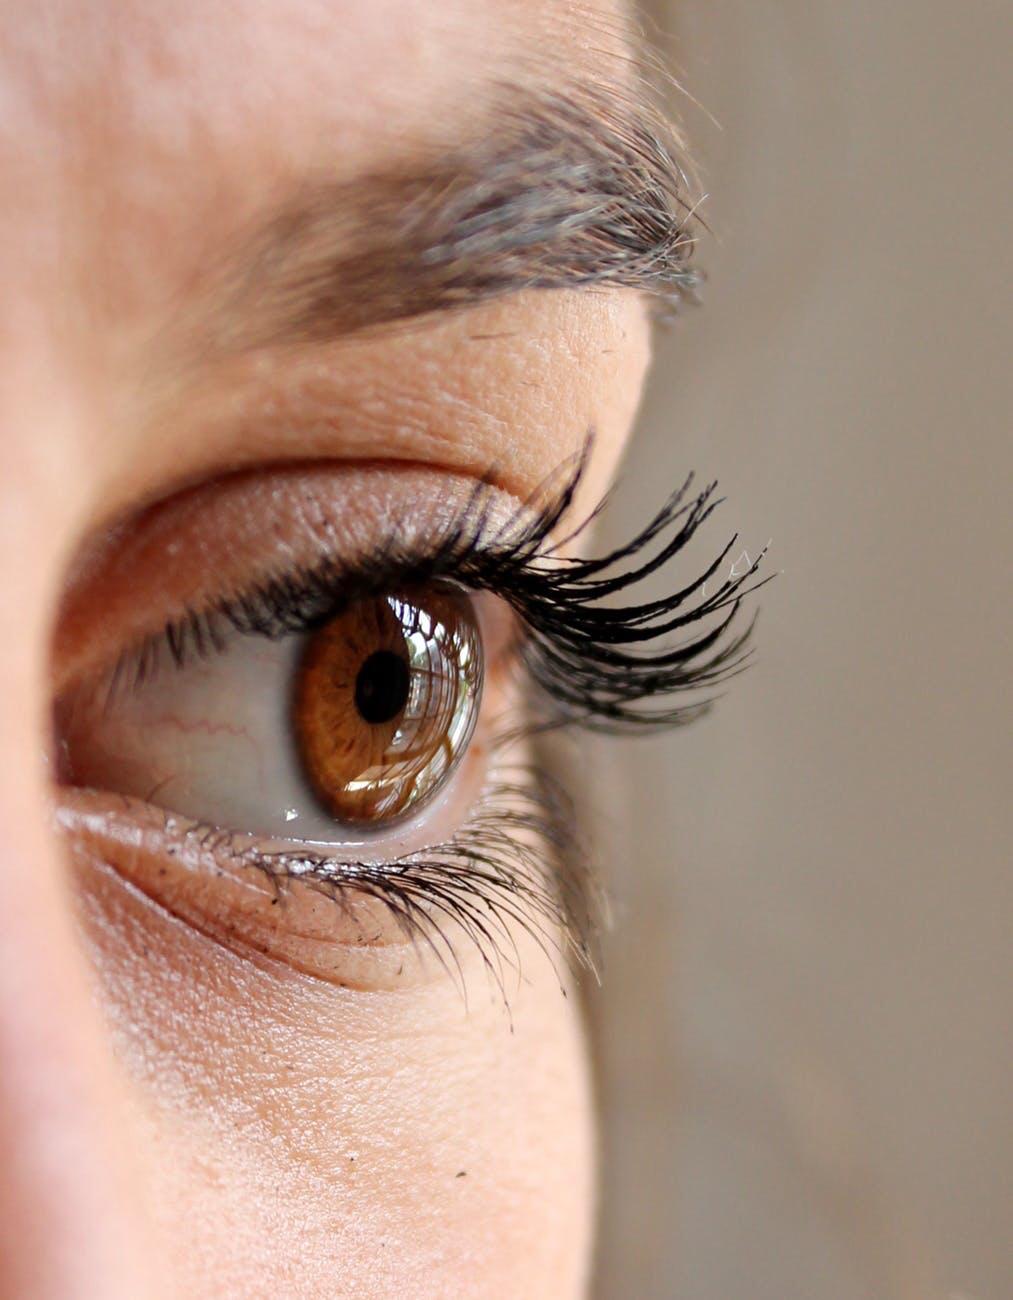 self-care for eye health